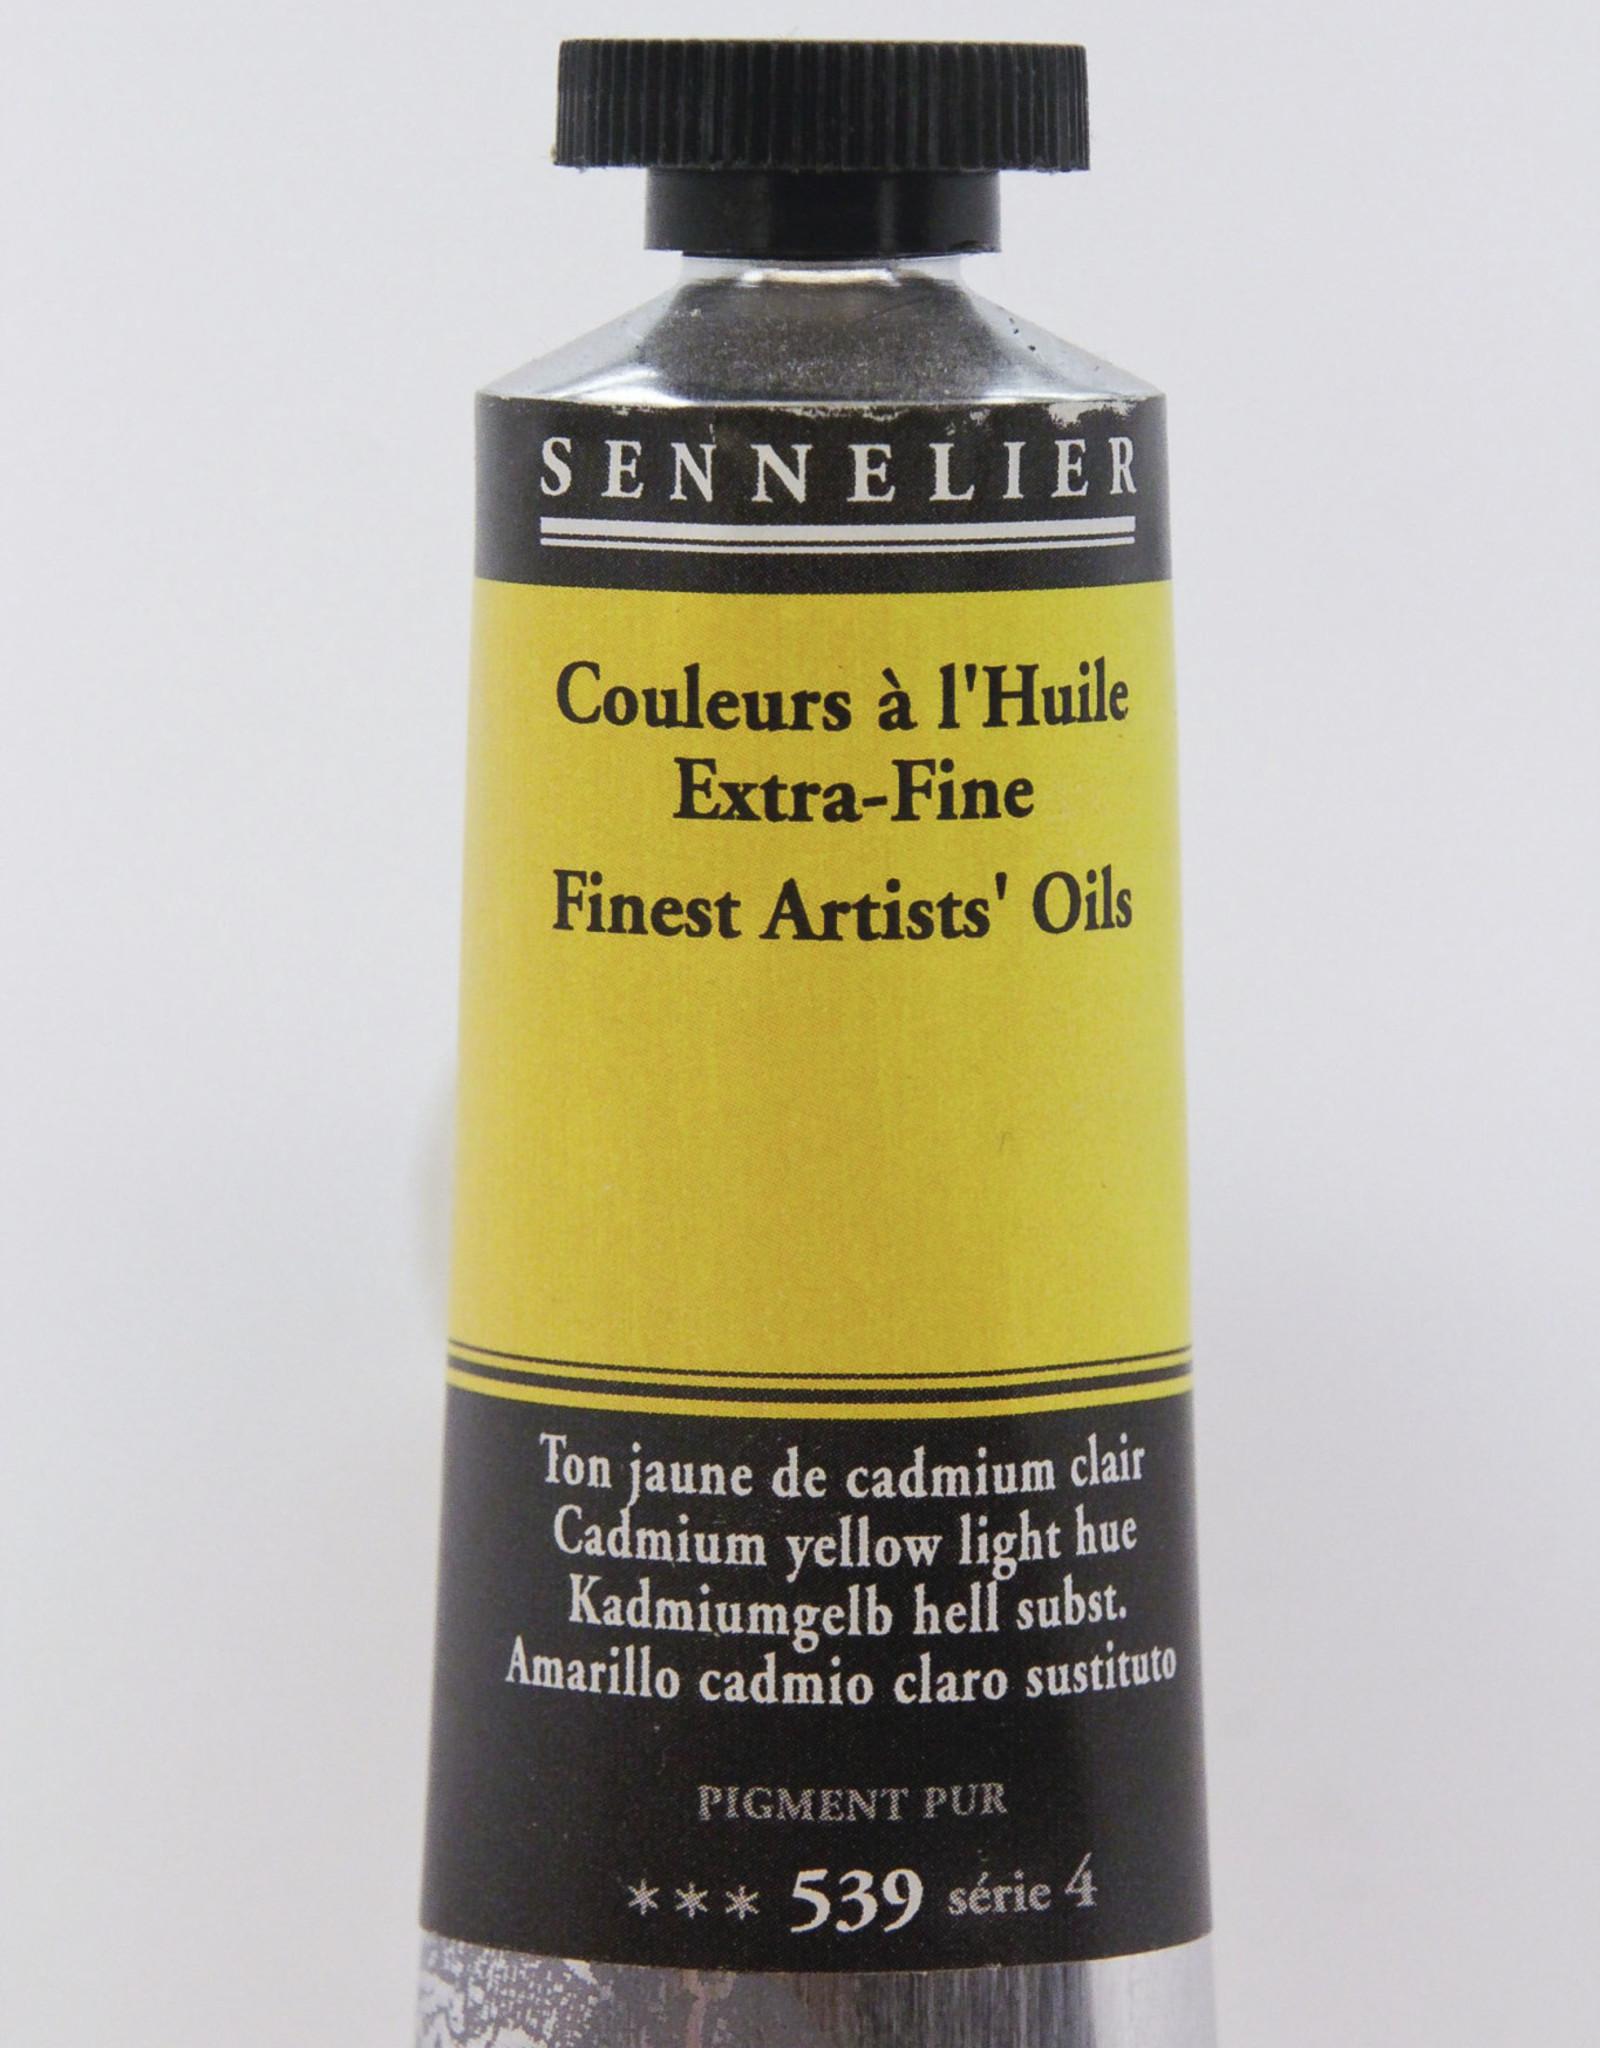 Sennelier, Fine Artists' Oil Paint, Cadmium Yellow Light Hue, 539, 40ml Tube, Series 4